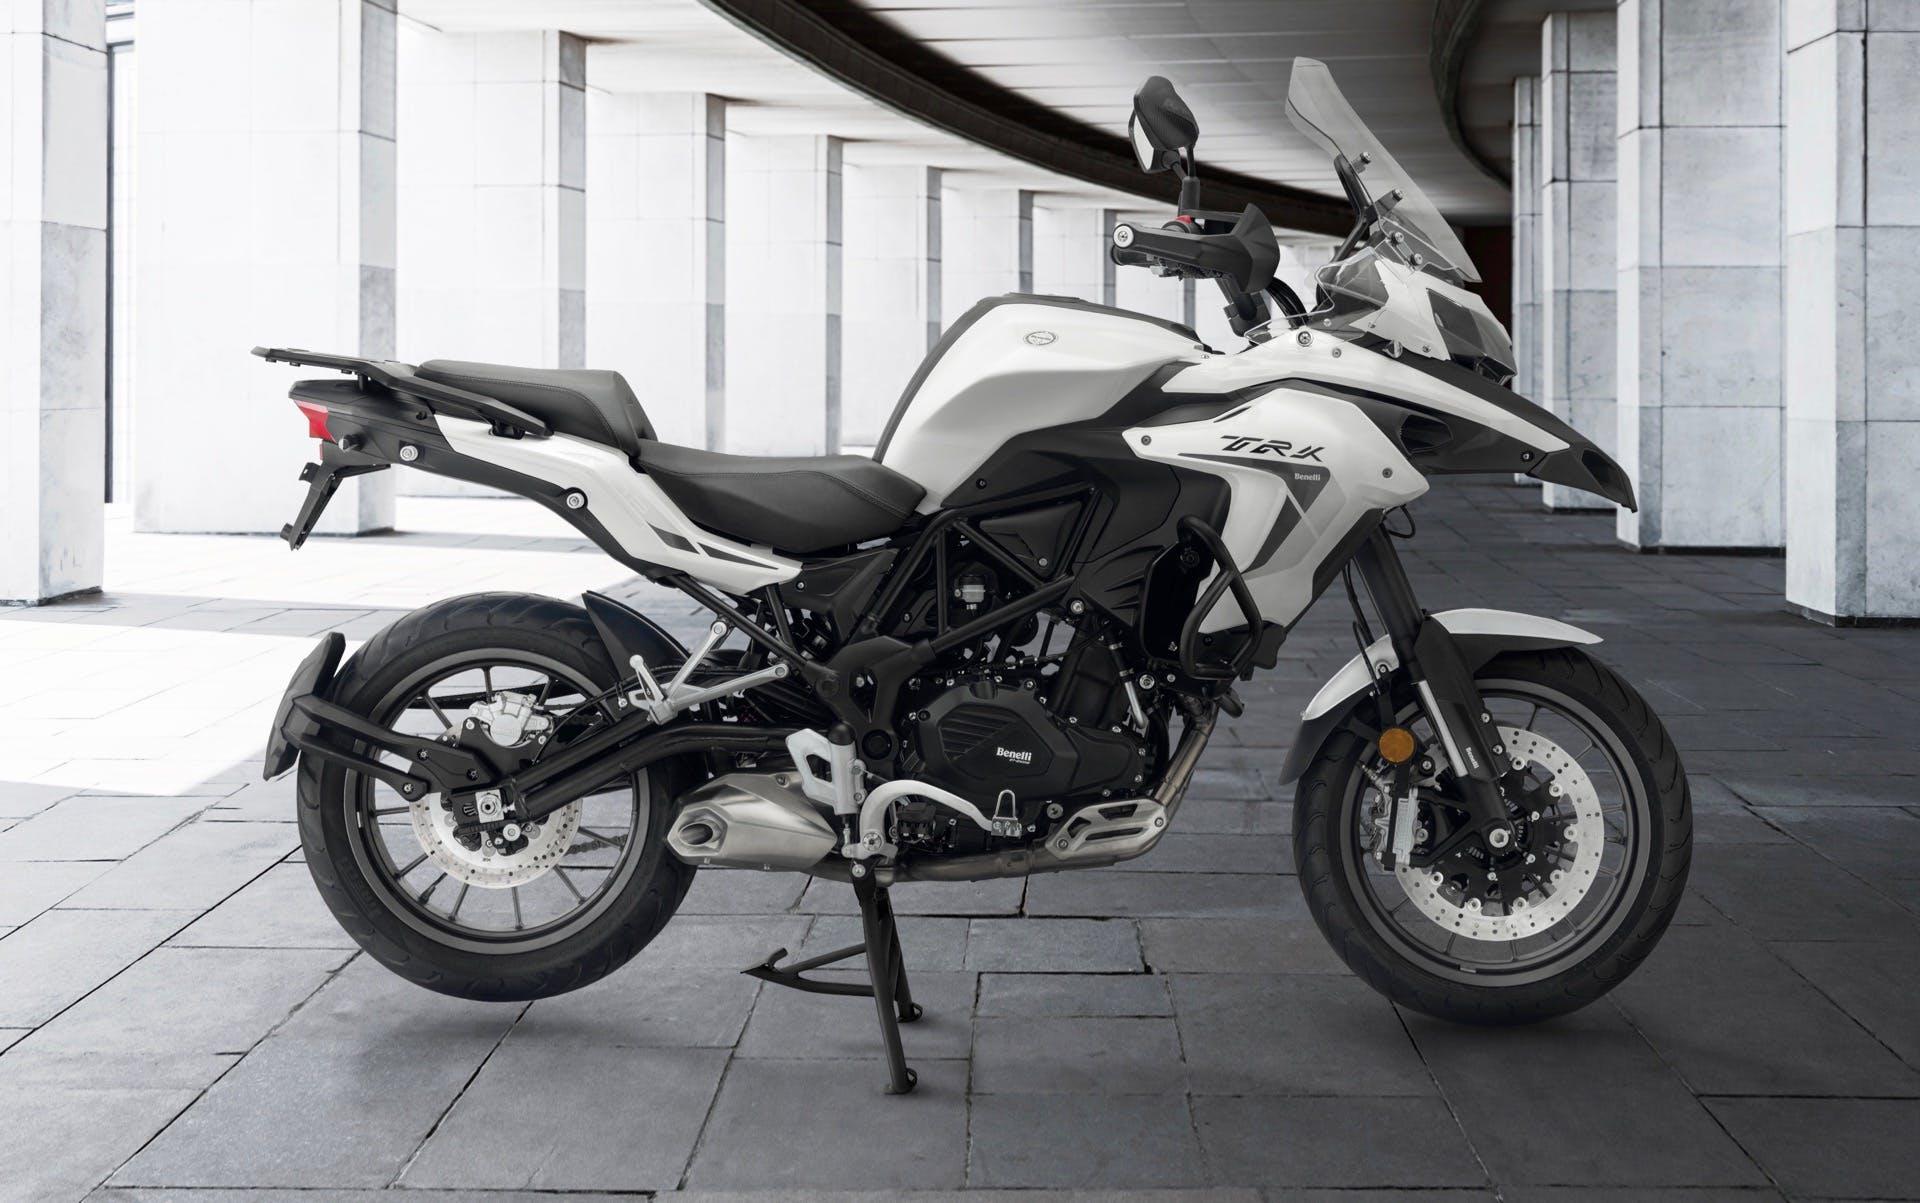 Benelli TRK 502 2021 migliori moto per neopatentati A2